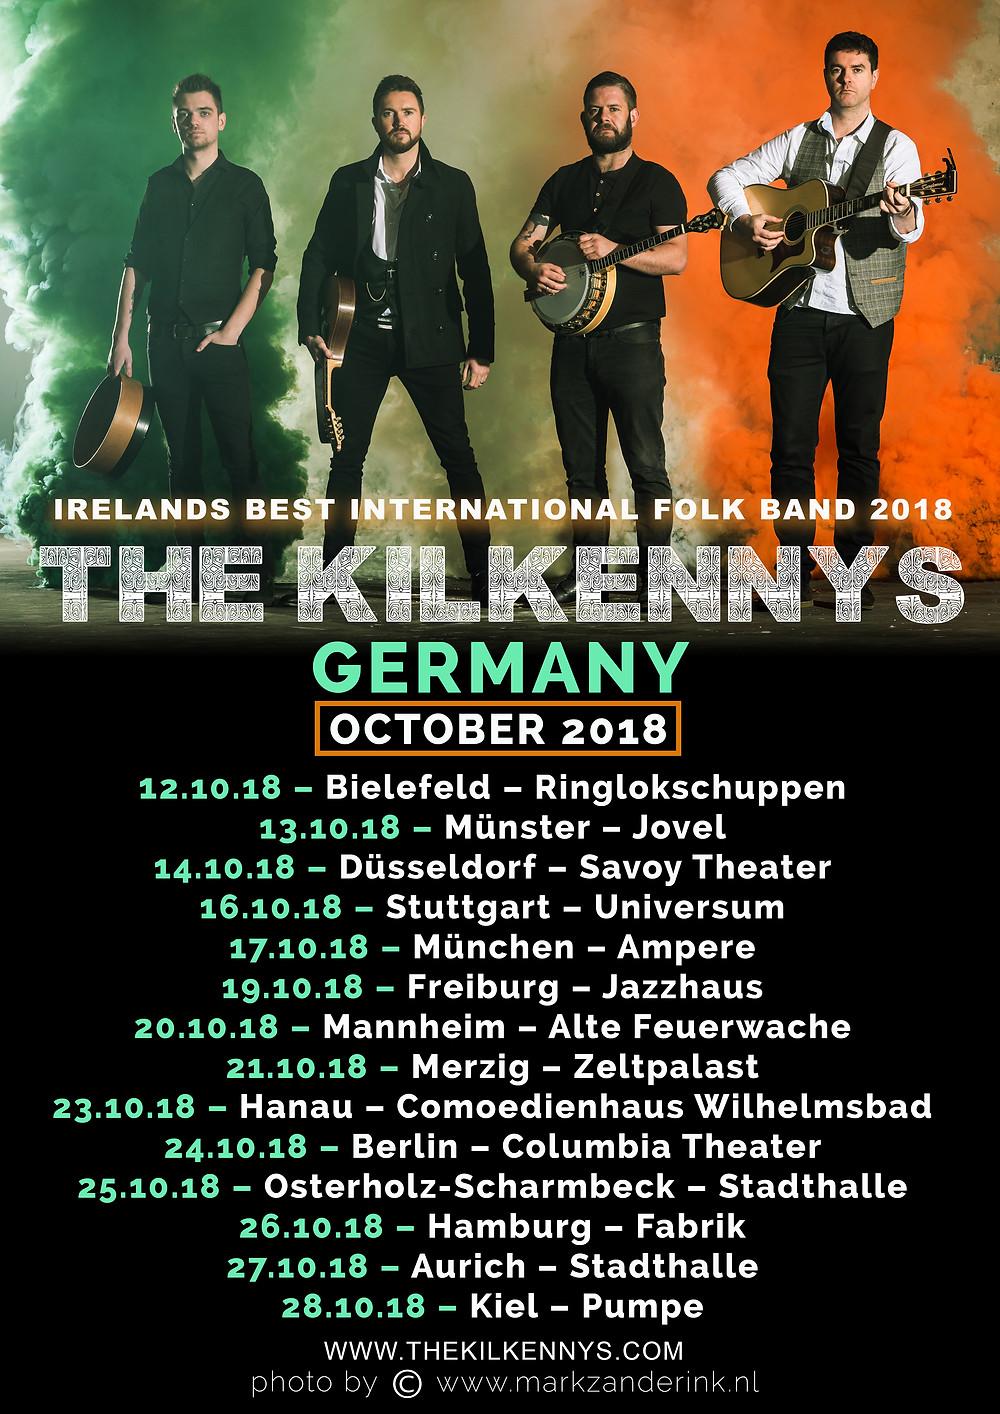 The Kilkennys Germany 2018 - Irelands Best International Folk Group